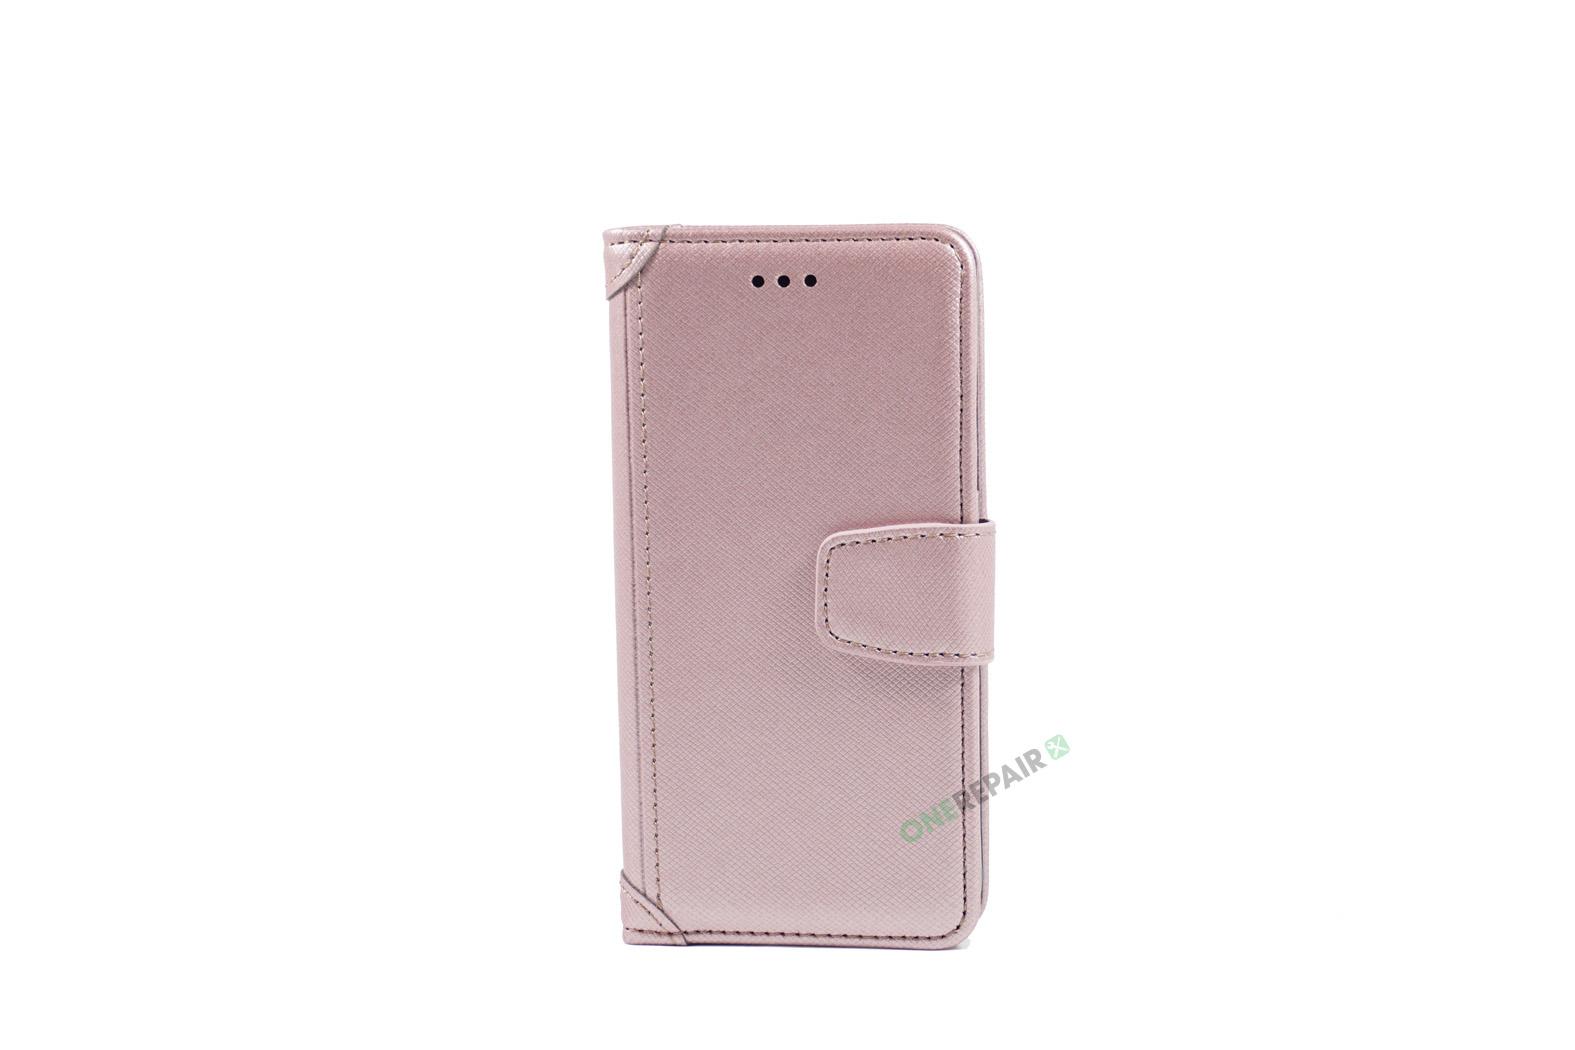 350788_iPhone_7_8_Luxury_Flipcover_Cover_Lyseroed_Pink_OneRepair_WM_00001